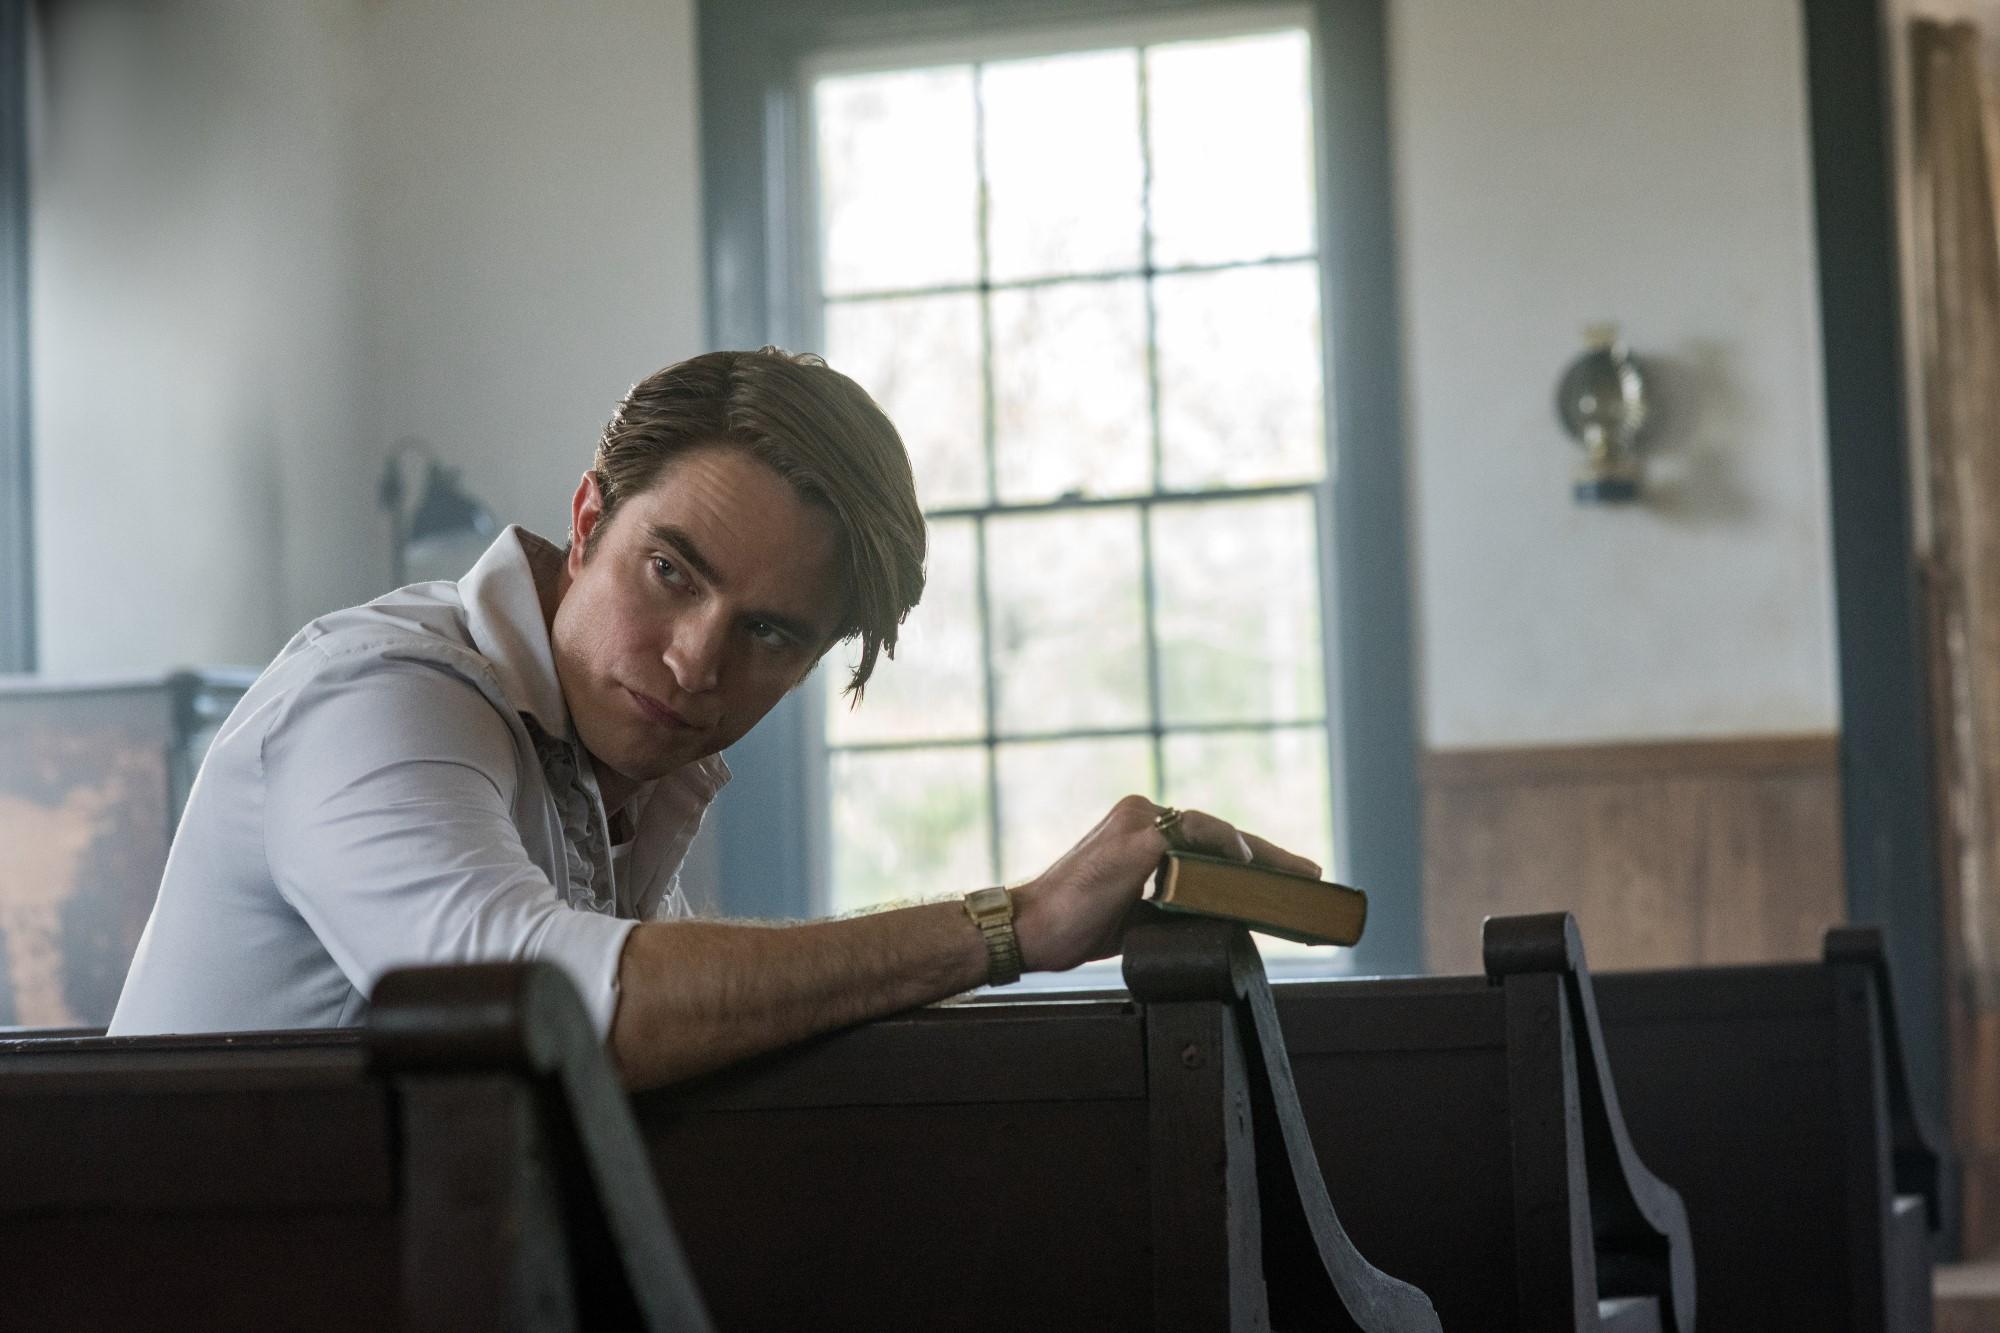 Netflix September slate: Tom Holland's The Devil All the Time, Millie Bobby Brown's Enola Holmes, & more 15